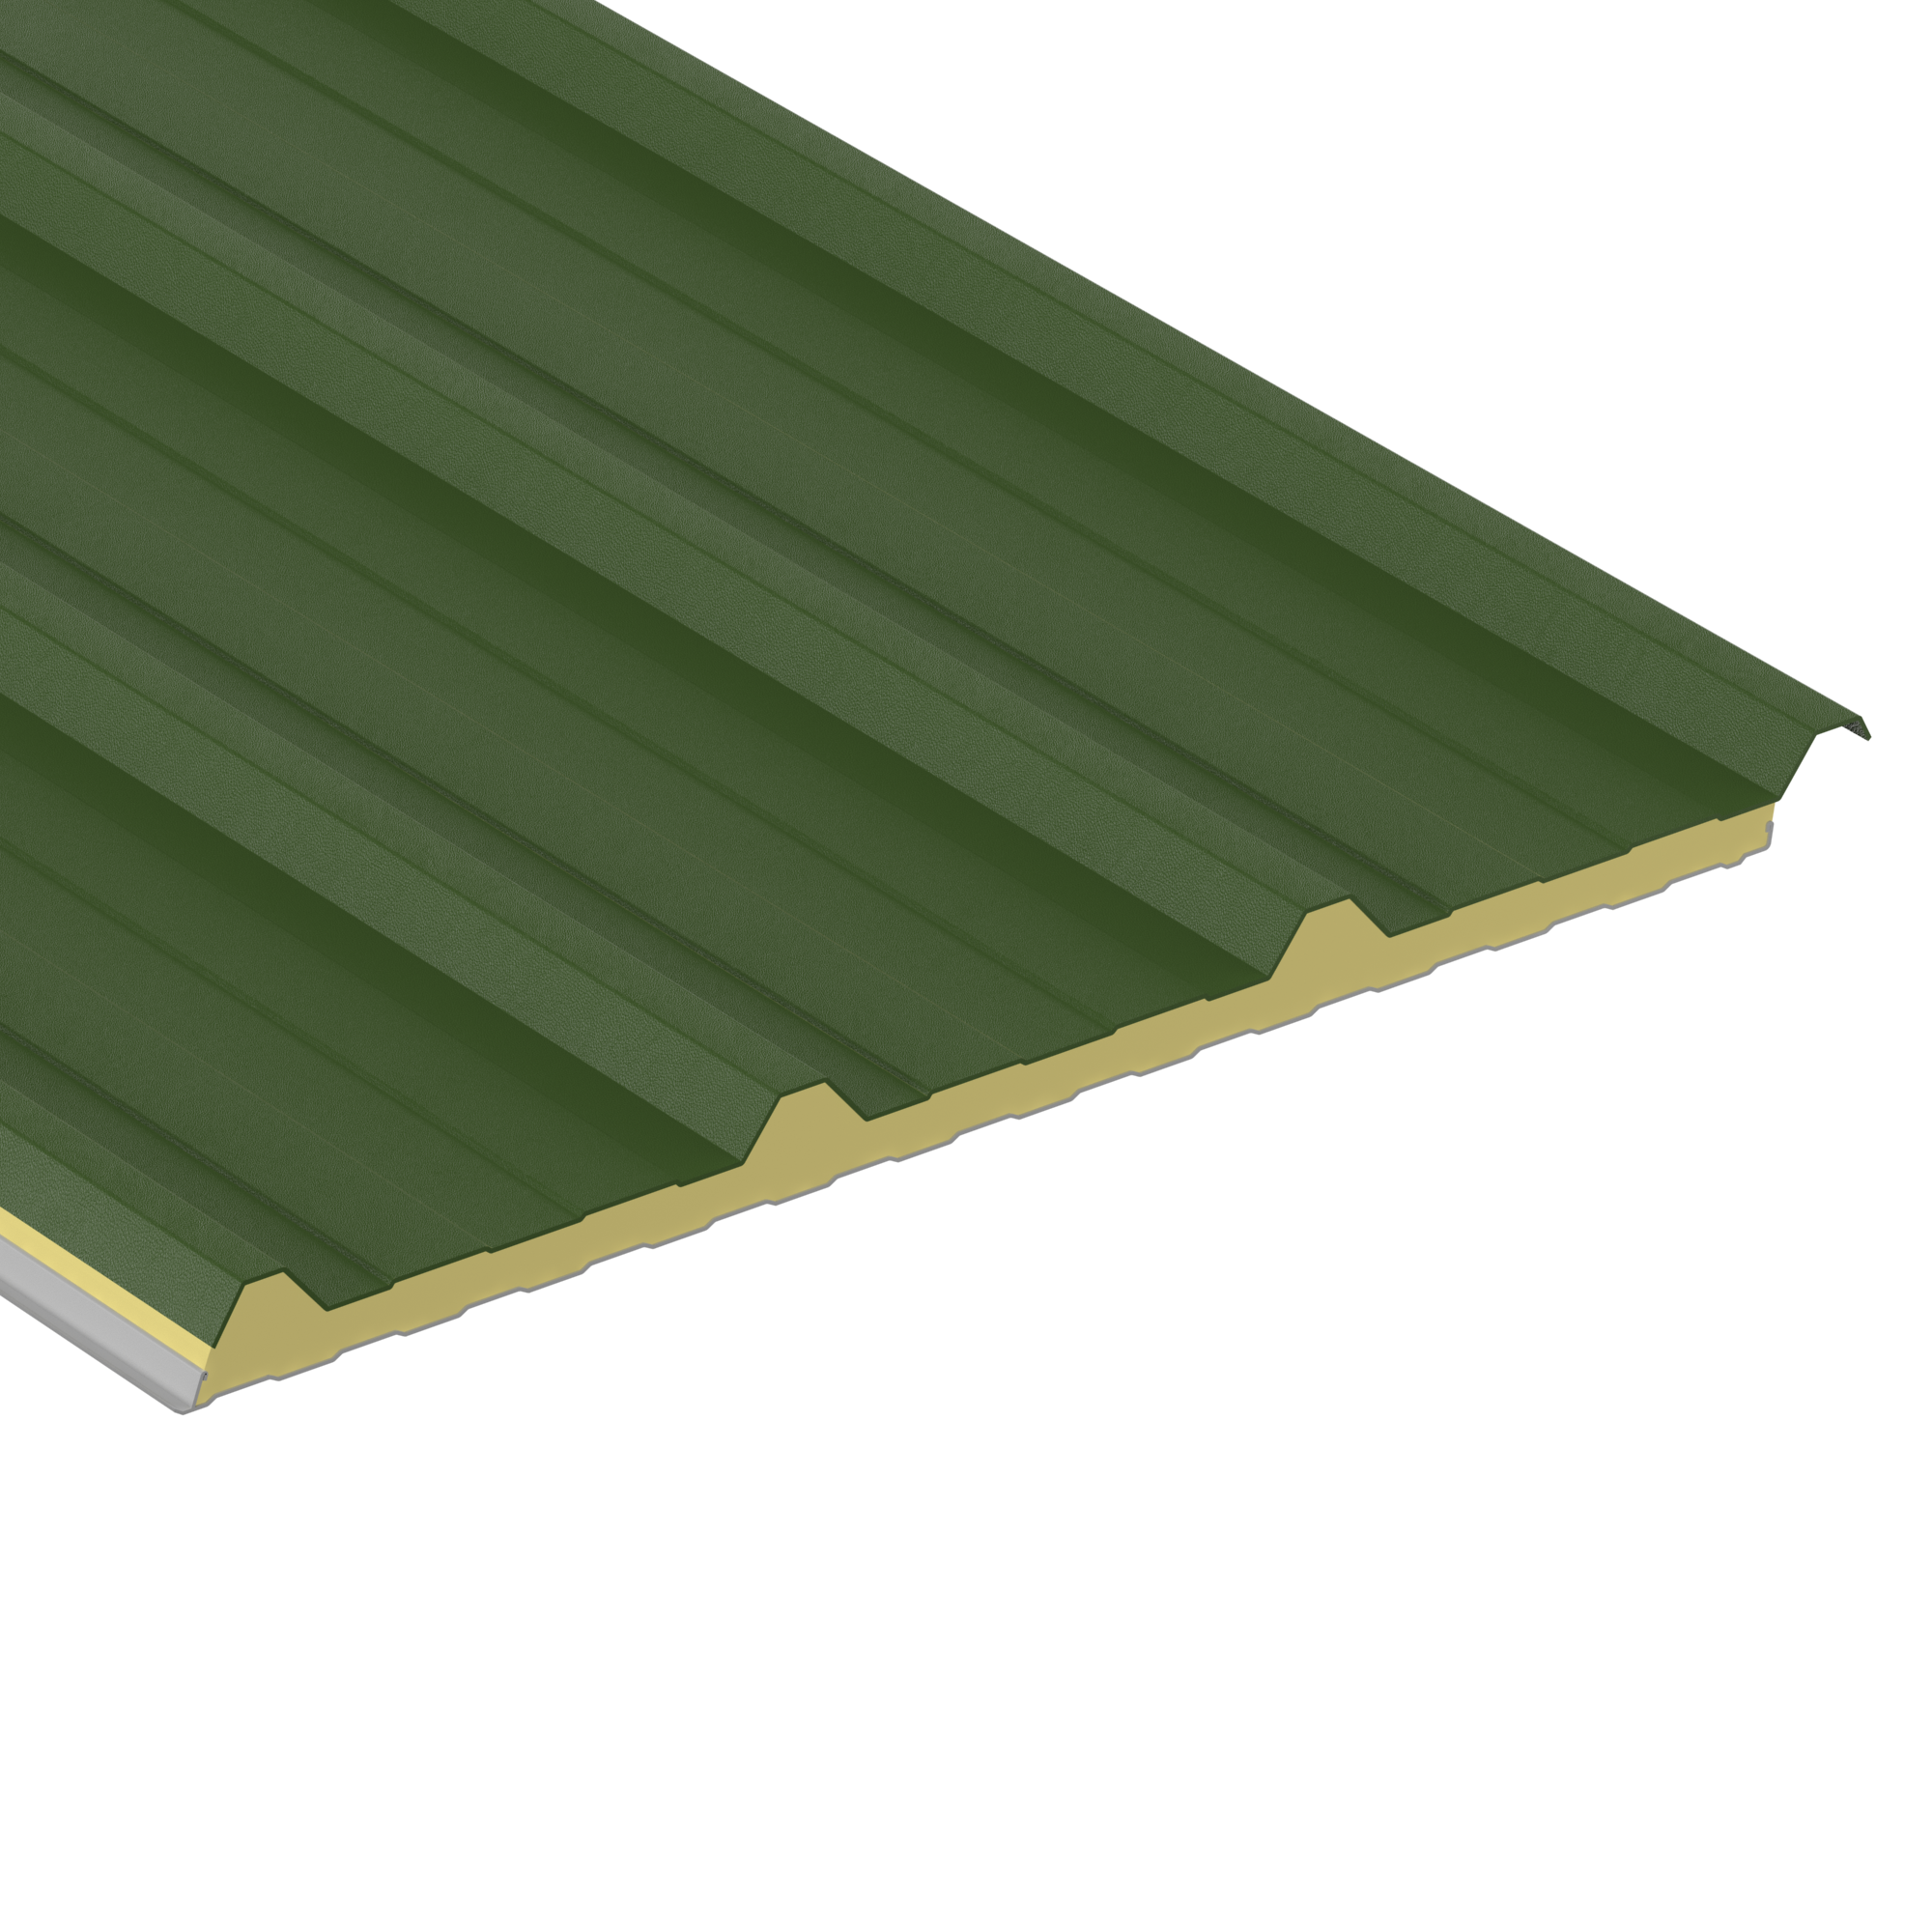 Juniper Green Composite Panel 4.050m